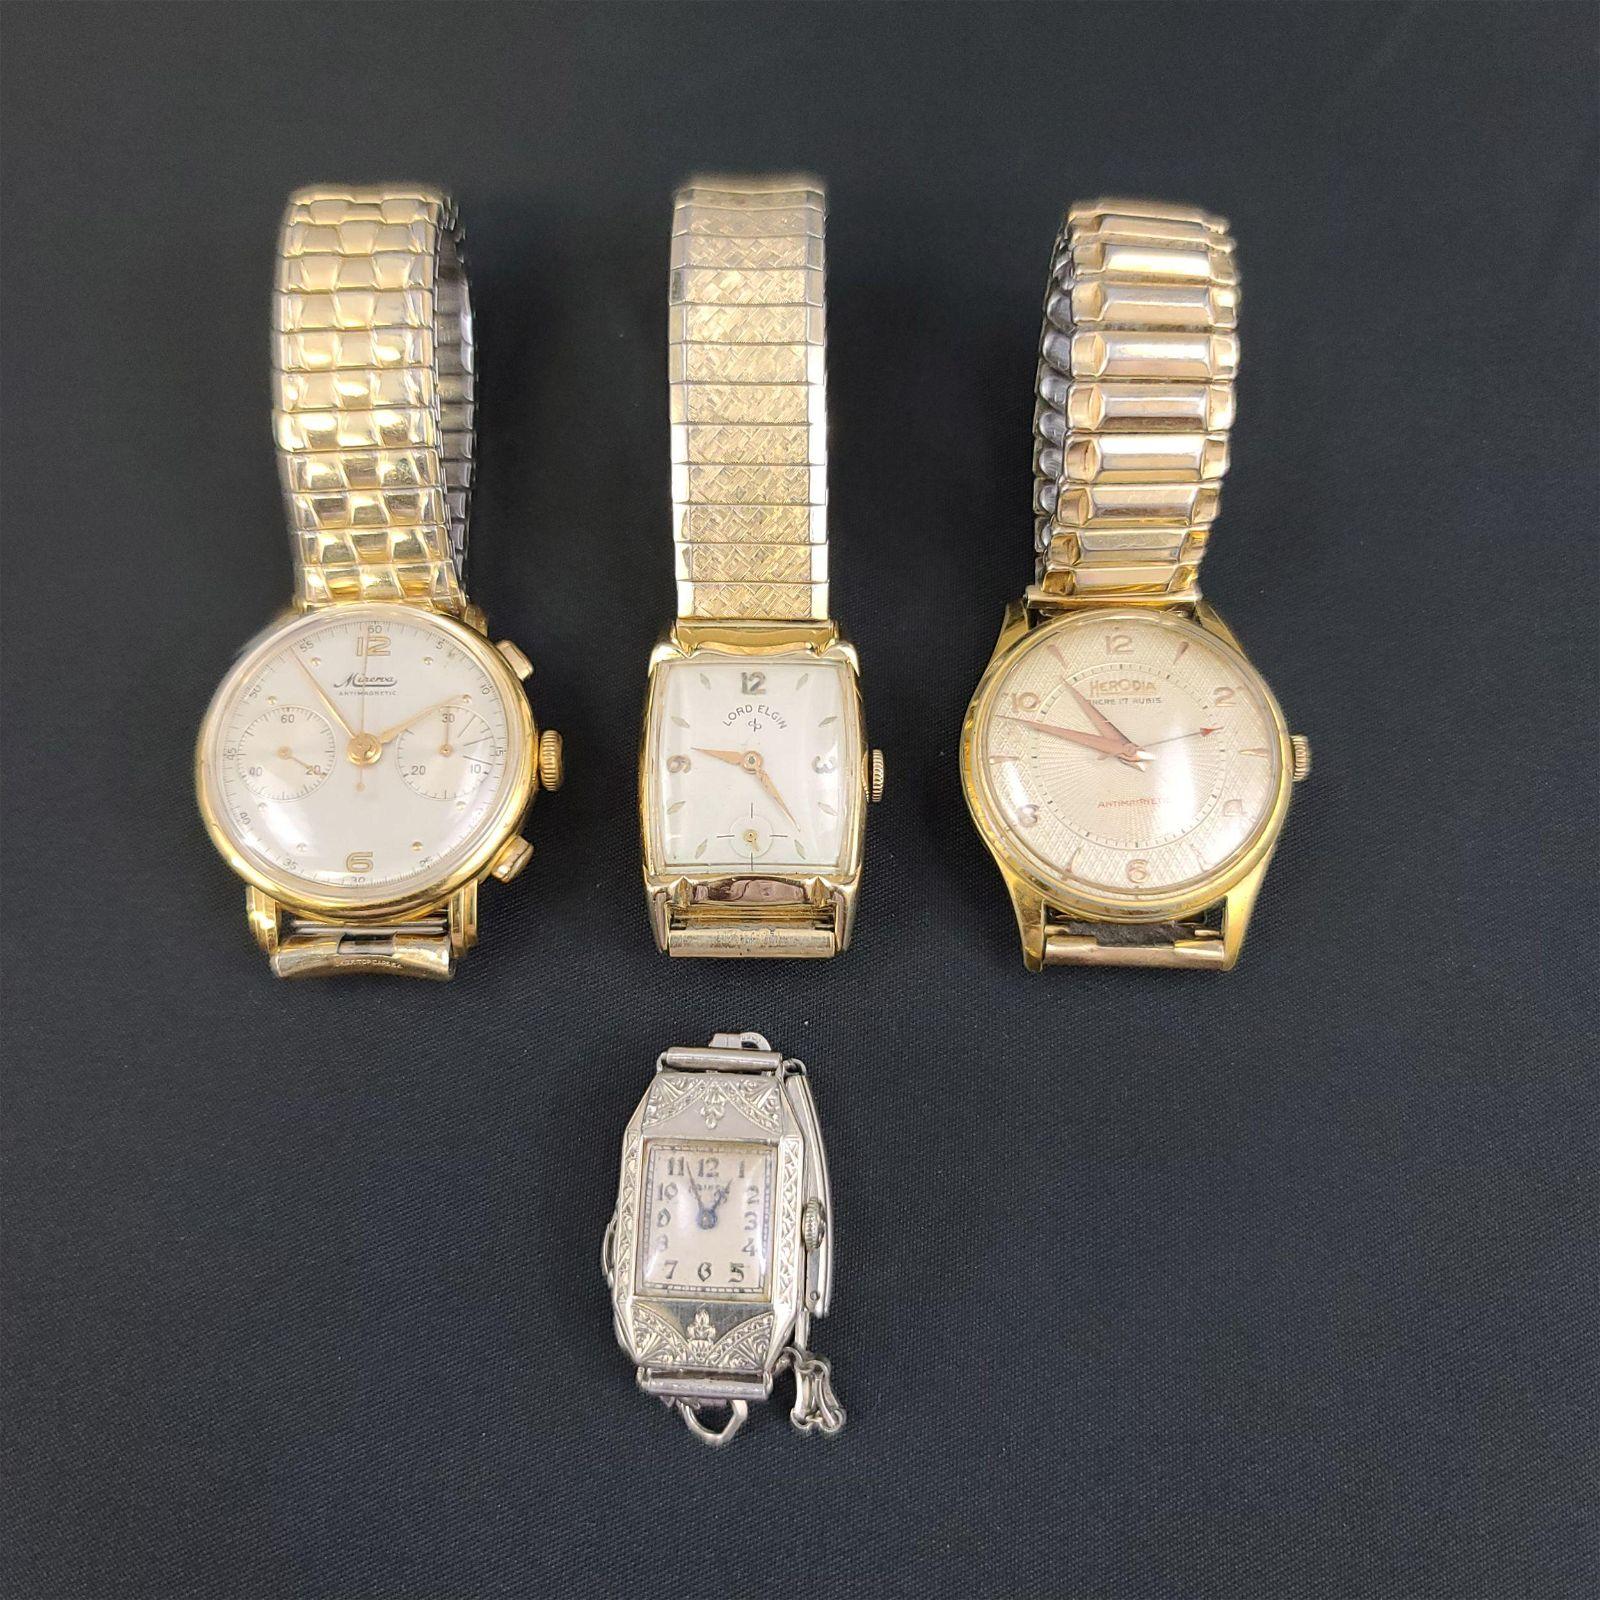 Lot of 4 Wrist Watches Minerva Chronograph 1920-1930